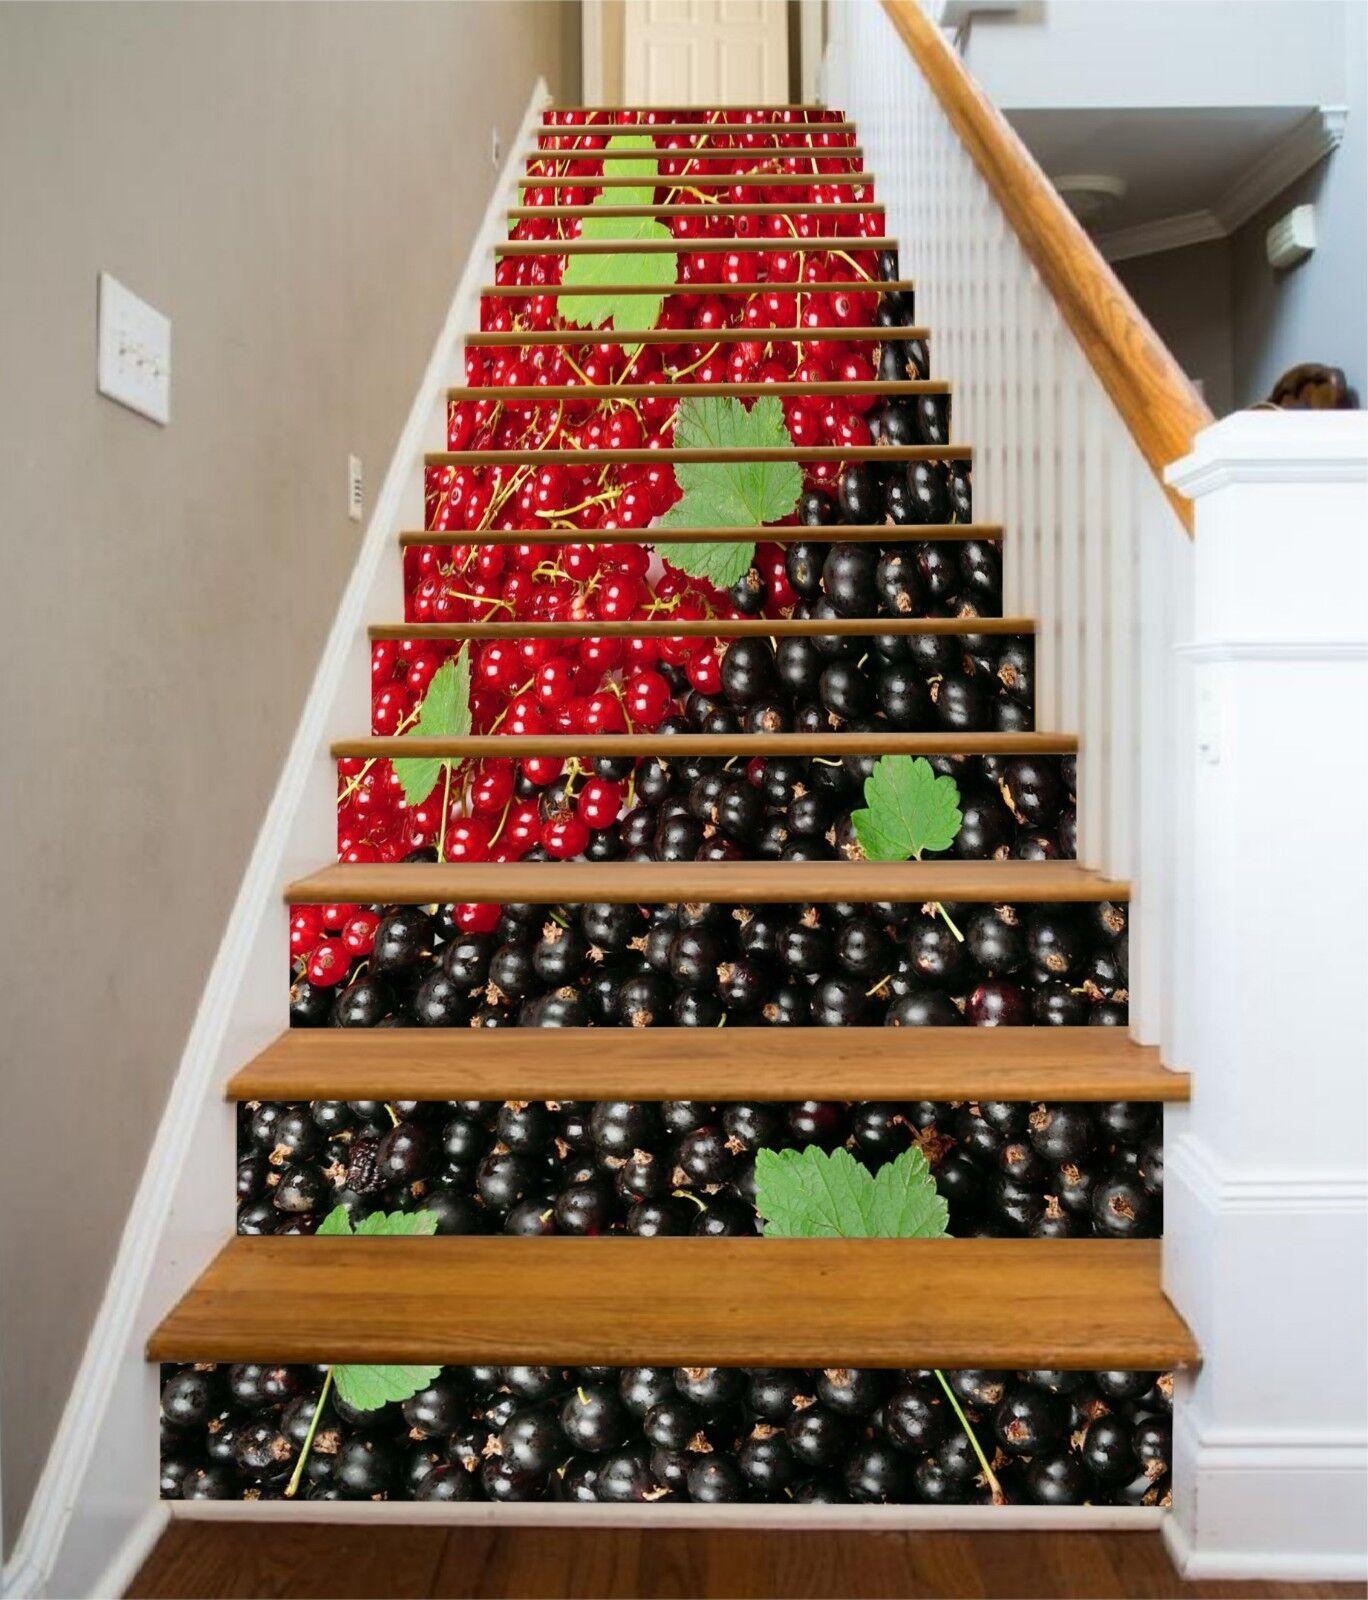 3D Cherry Blauberry Stair Risers Decoration Photo Mural Vinyl Decal Wallpaper UK